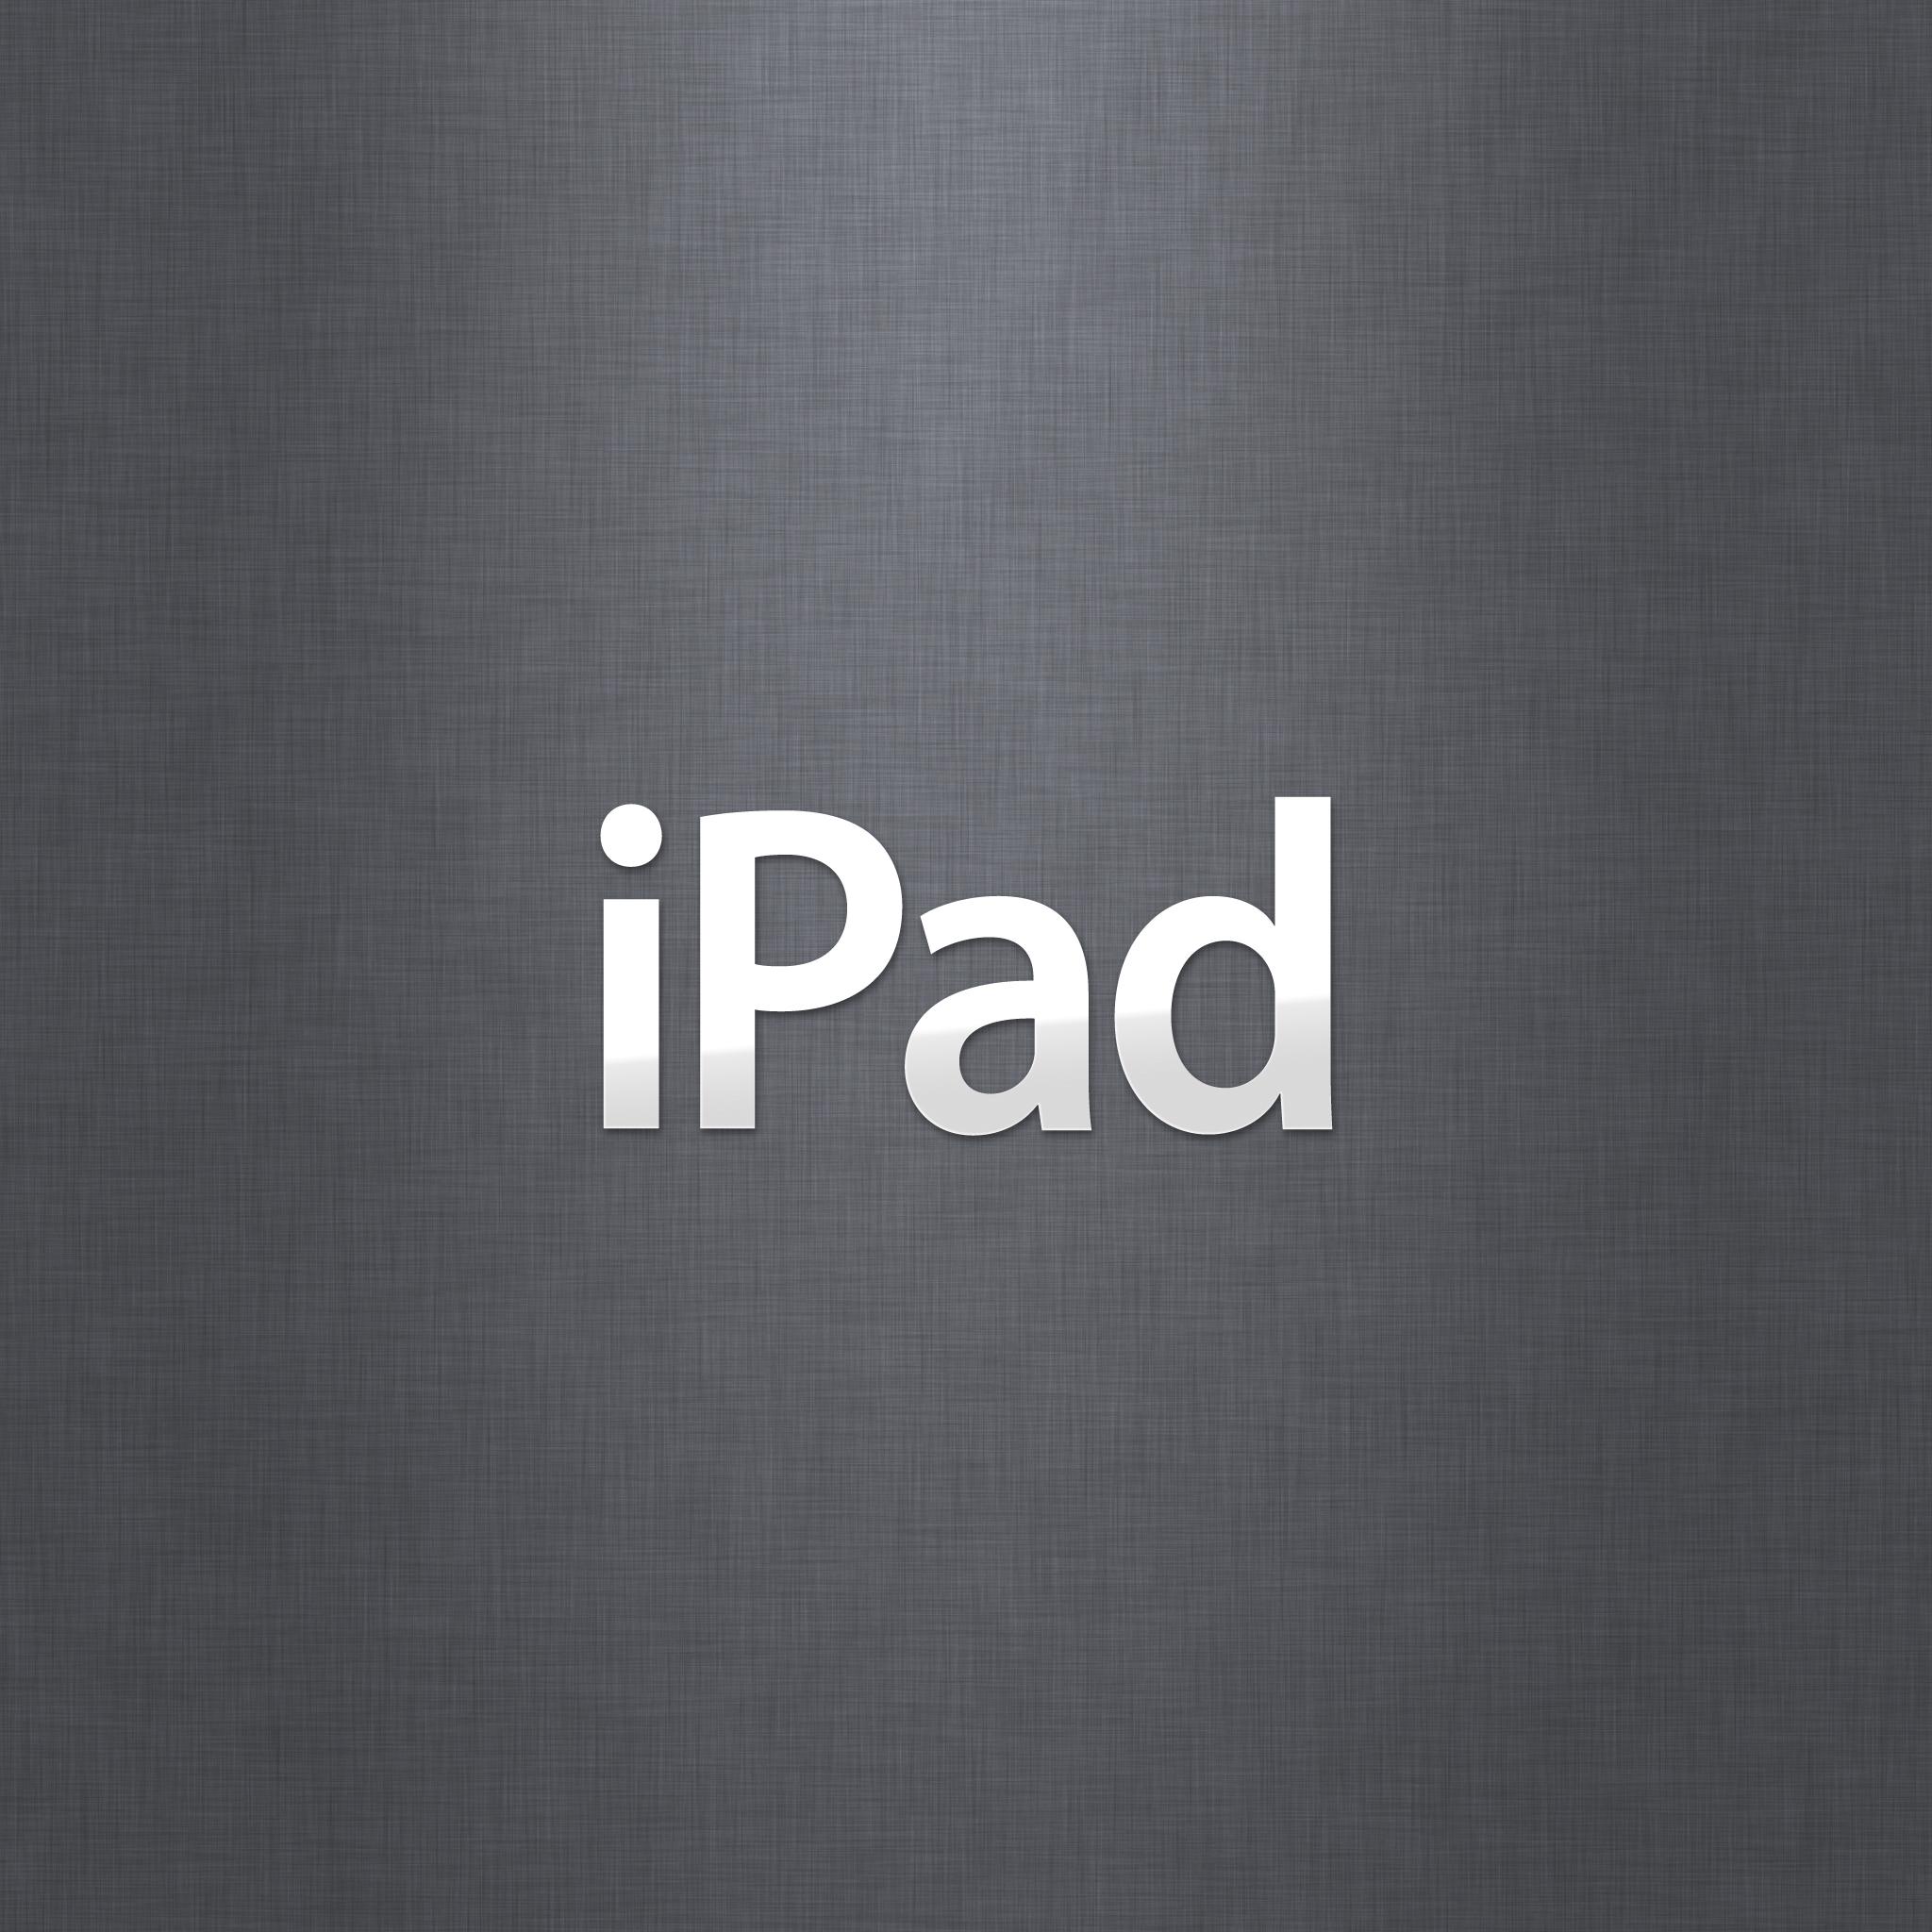 iPad 3 Welcome Wallpaper by almanimation iPad 3 Welcome Wallpaper by almanimation